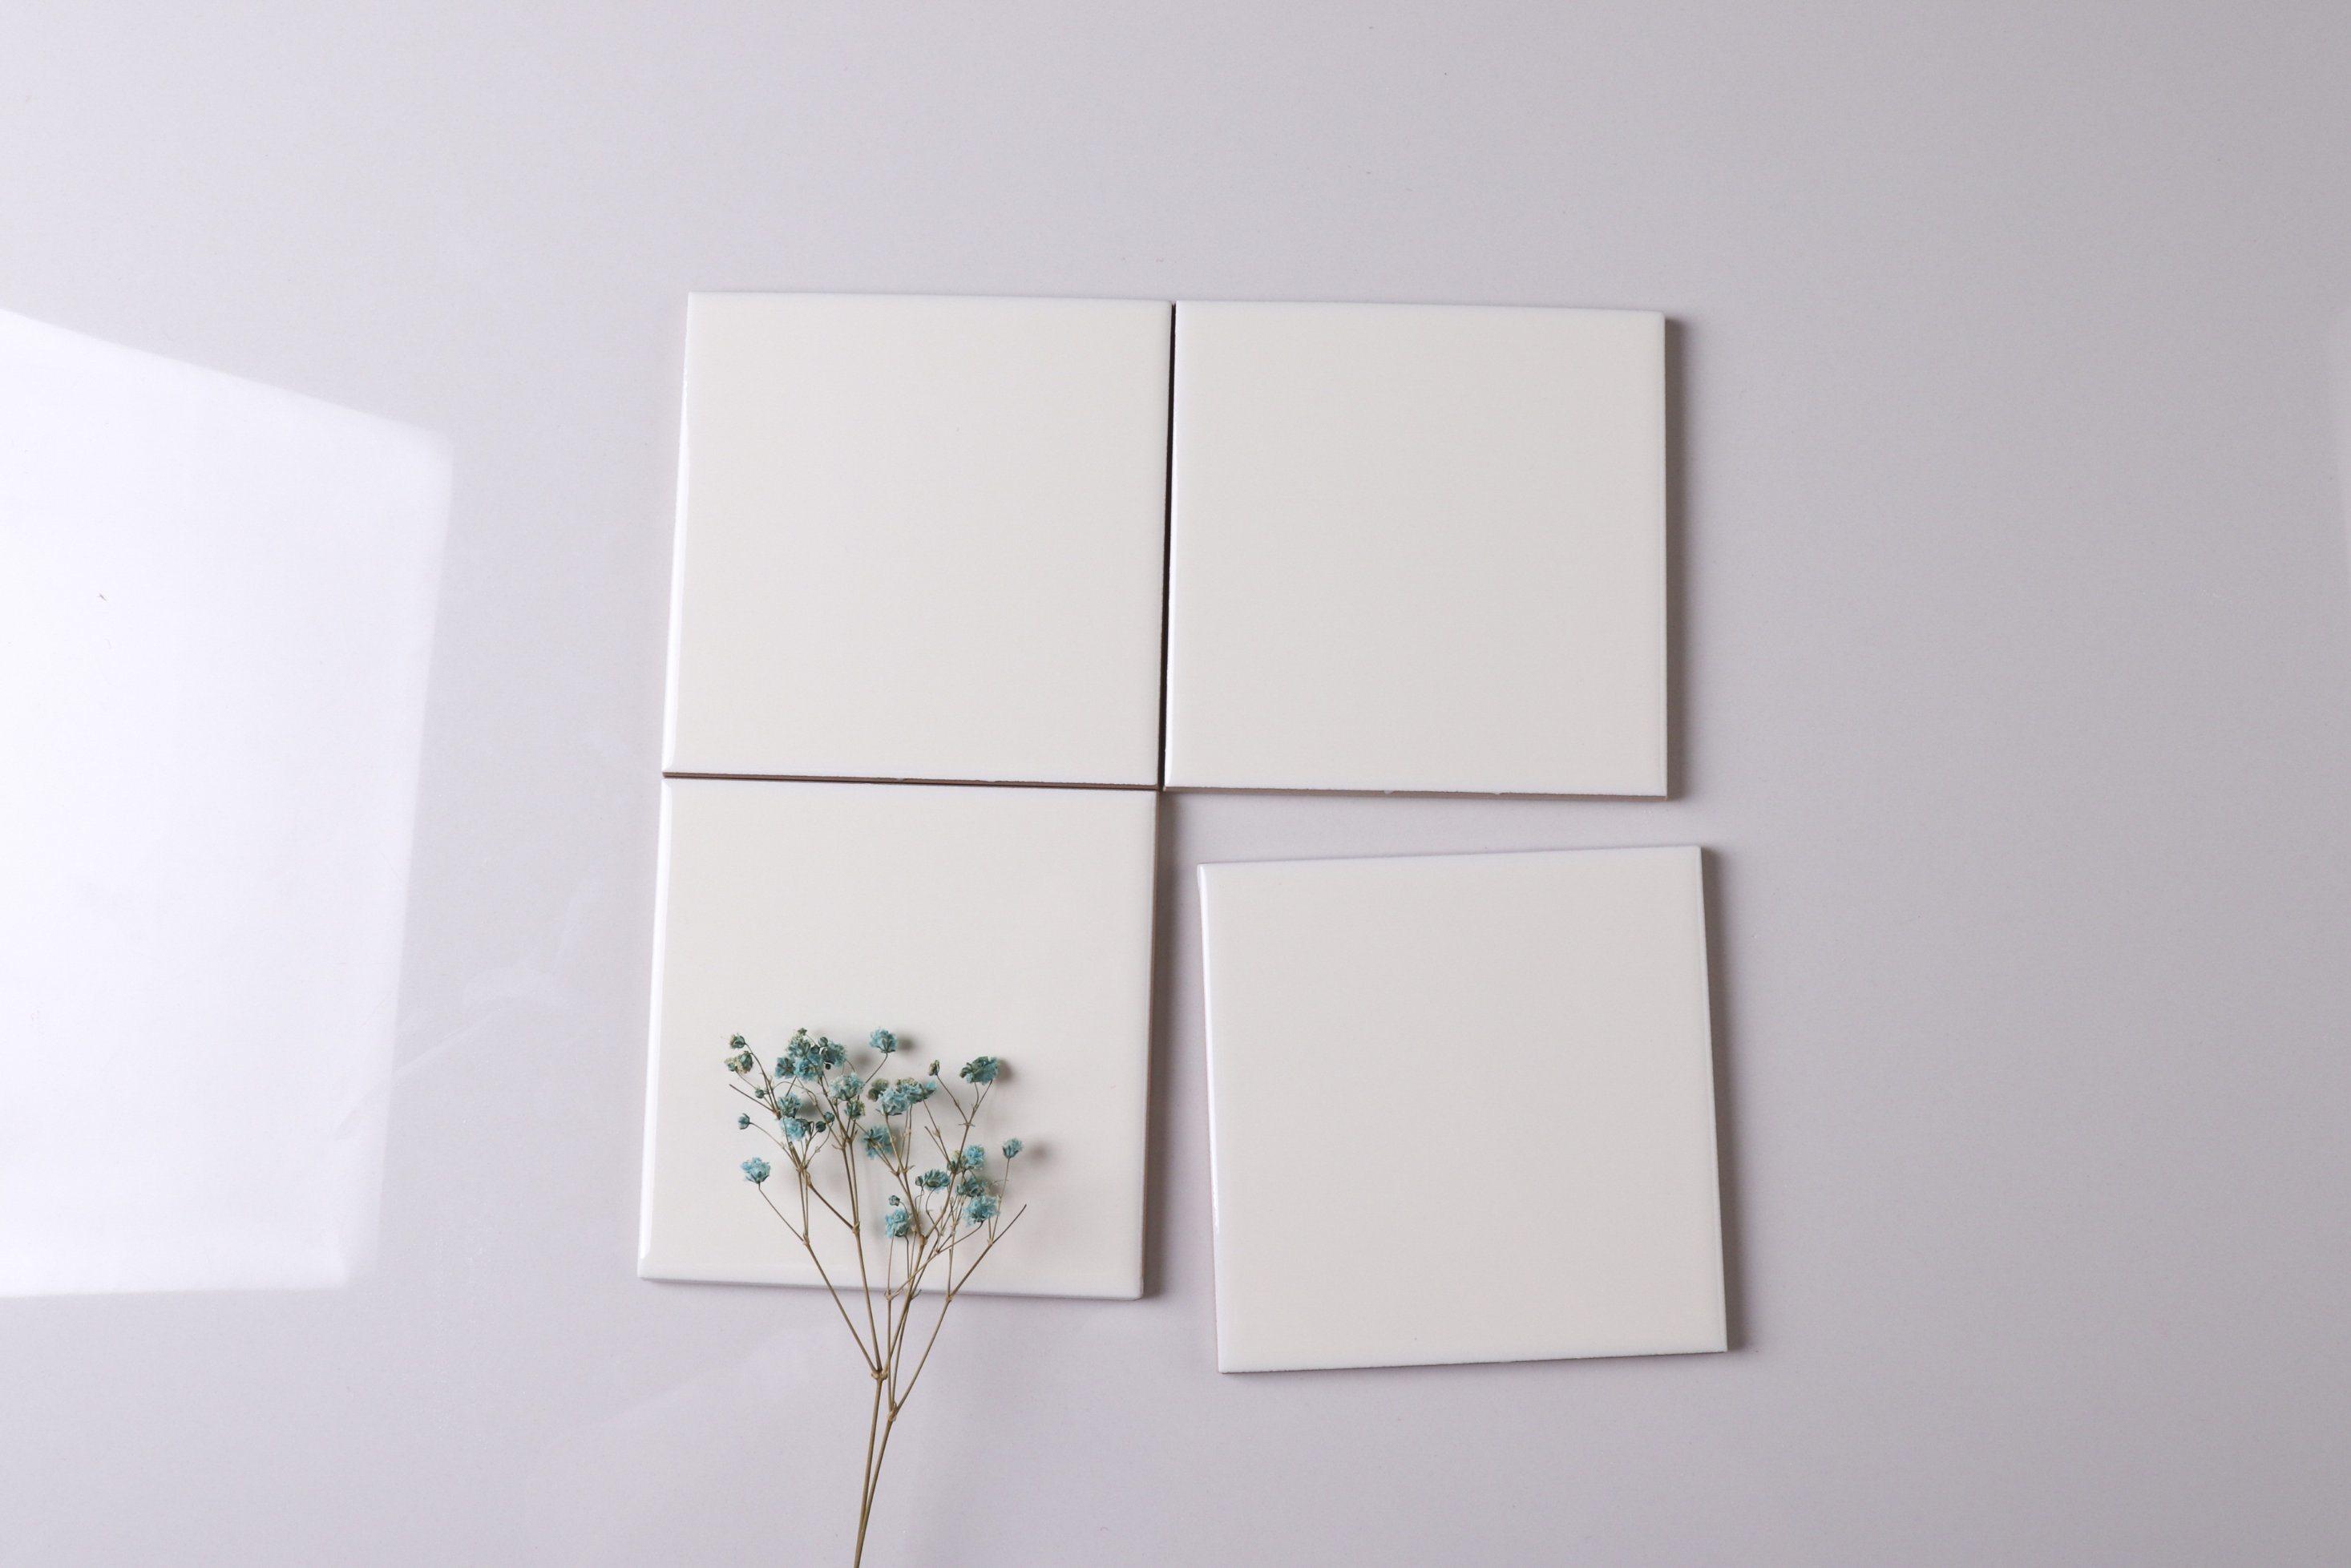 China Newest 10x10 Matt White Ceramic Tile For Bathroom Design Brick Tile Accessories China Grey Ceramic Tile Brick Tile Accessories